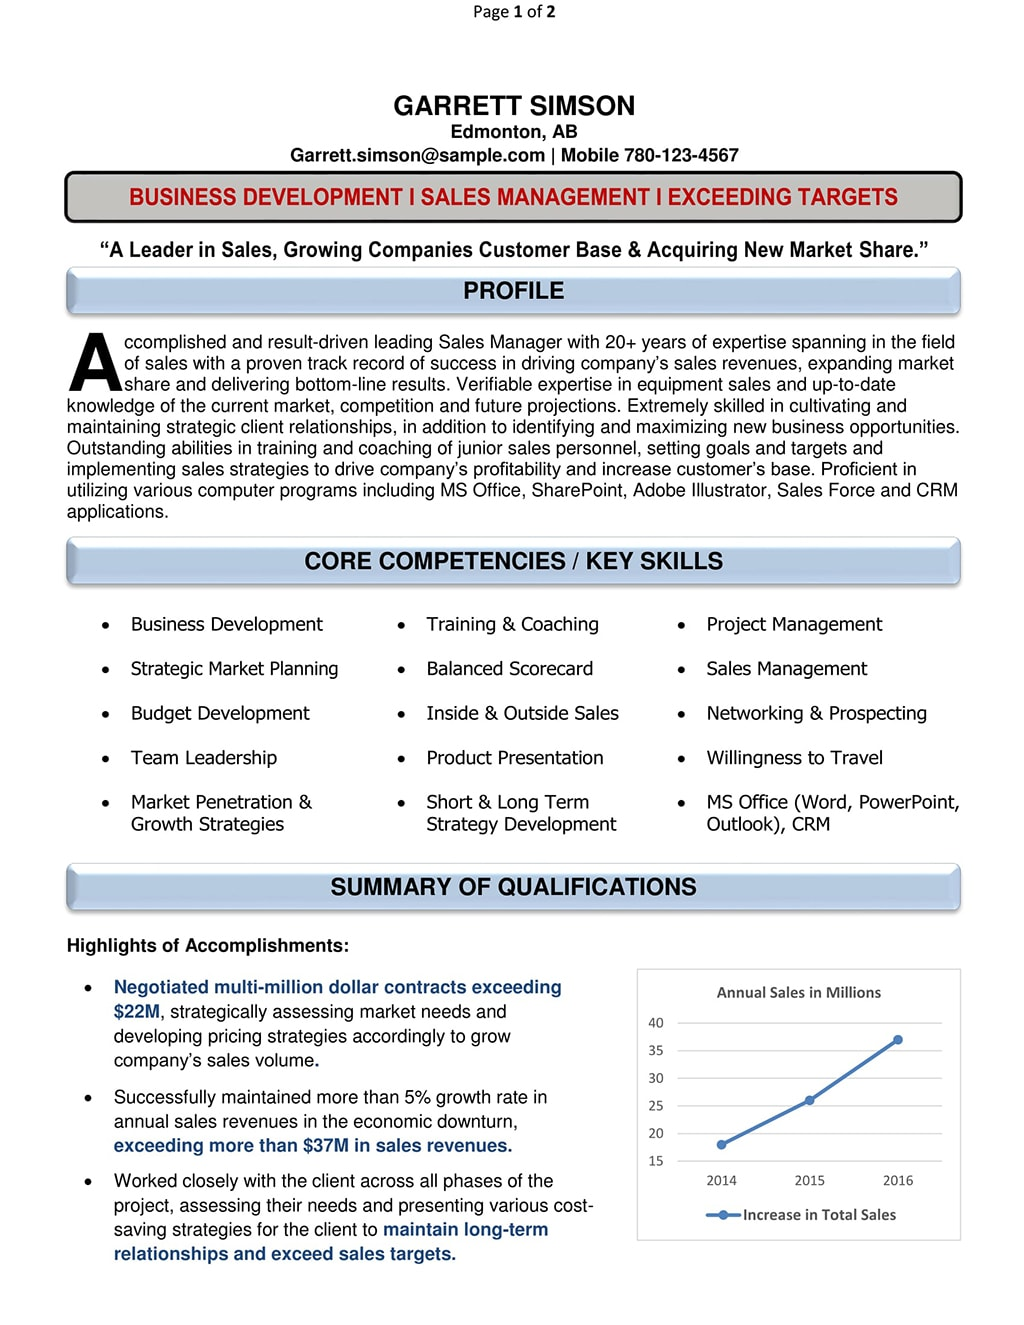 Free resume services edmonton sample of cover letter for nursing job